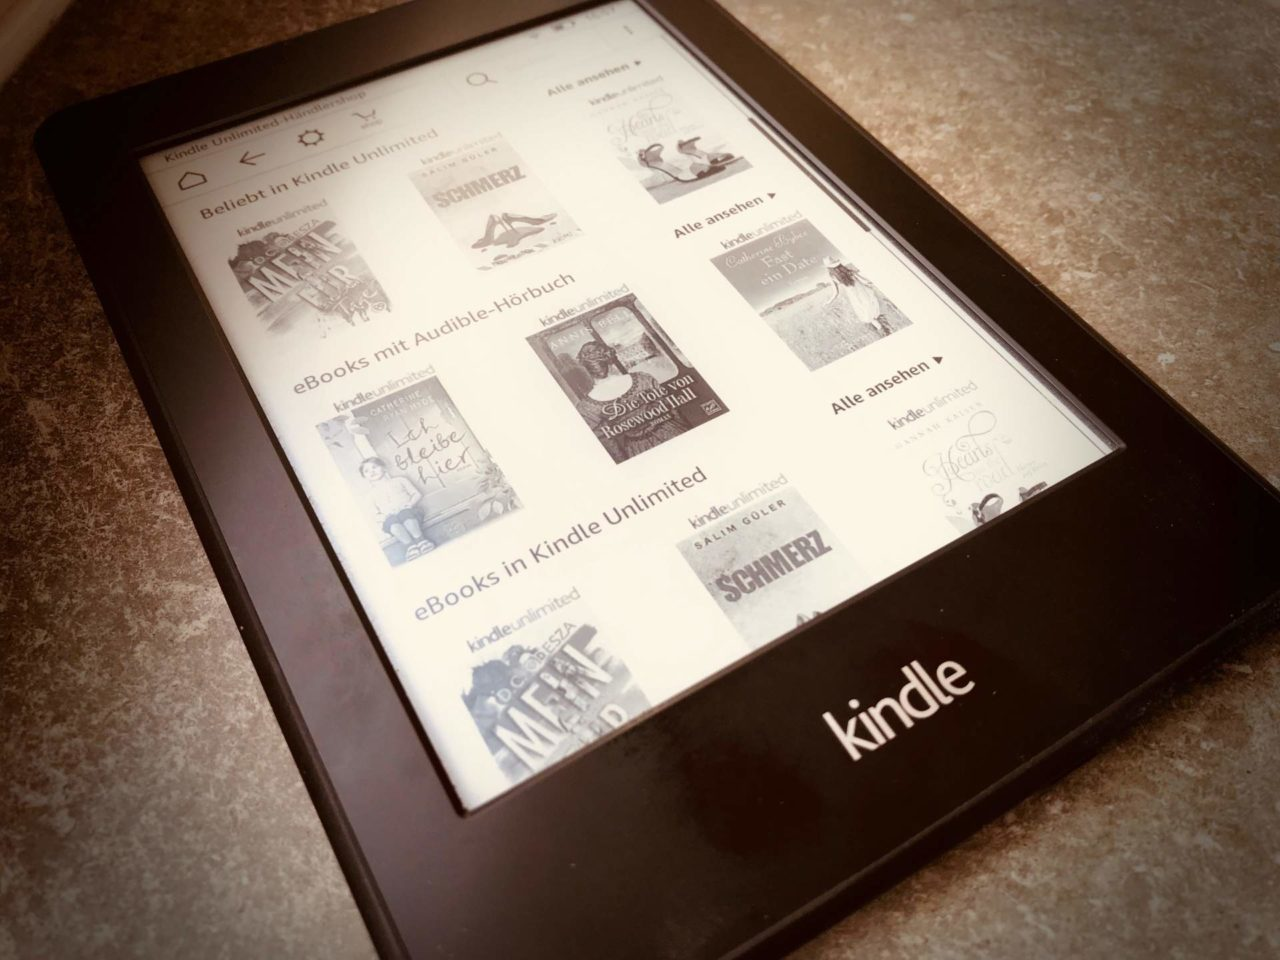 Anleitung: Kindle Unlimited-Abo beenden - Der Tutonaut - photo#40